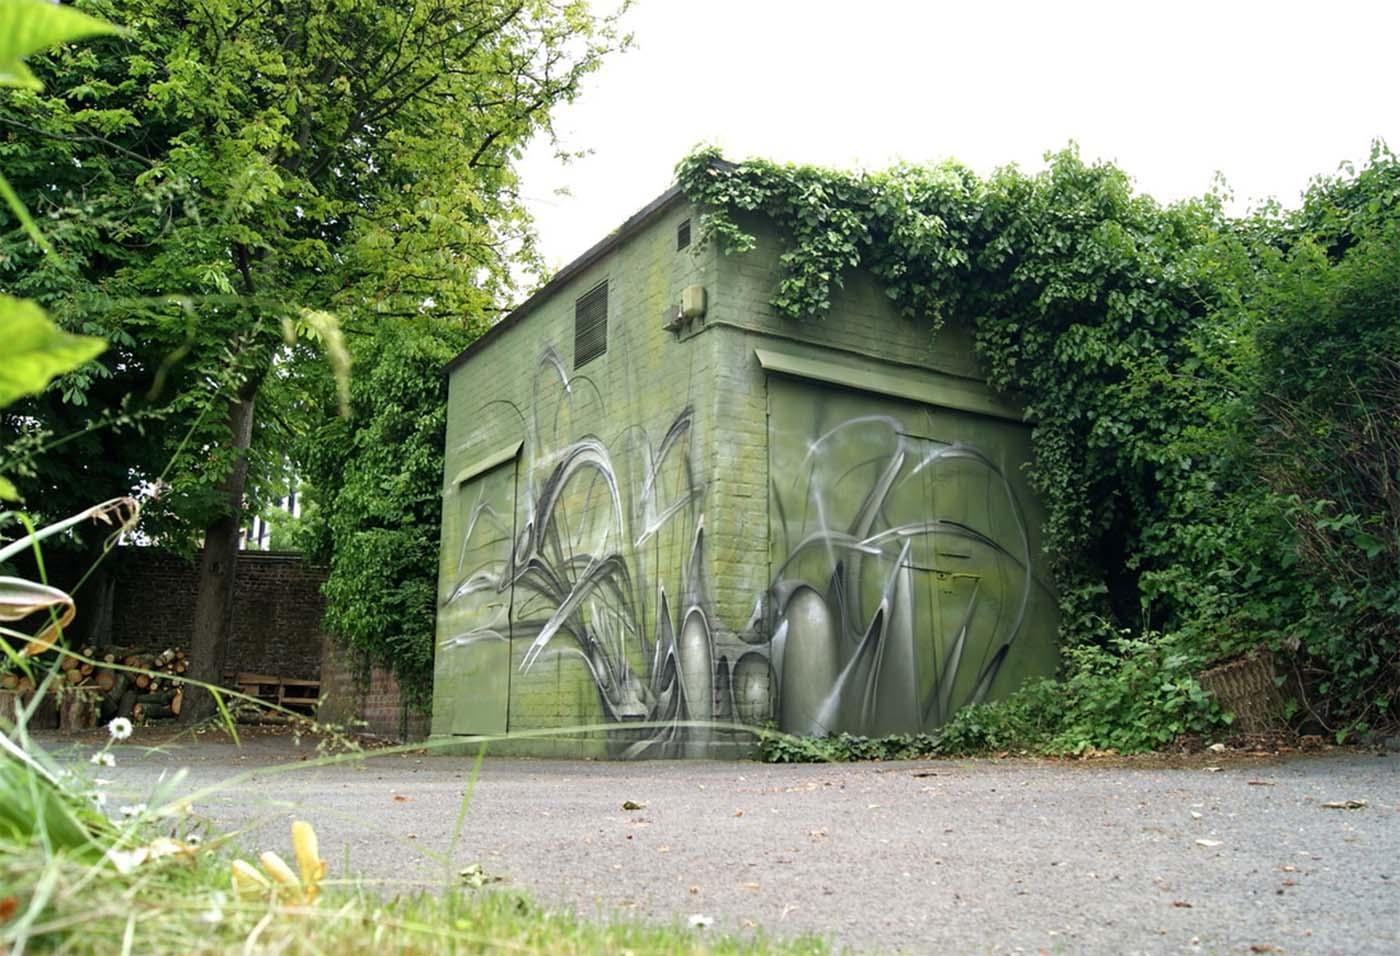 https://www.propaganza.be/wp-content/uploads/2019/04/Amin-abstract-nature-propaganza-urban-artist-graffiti-graff-street-art-spray-painting-belgique-4.jpg